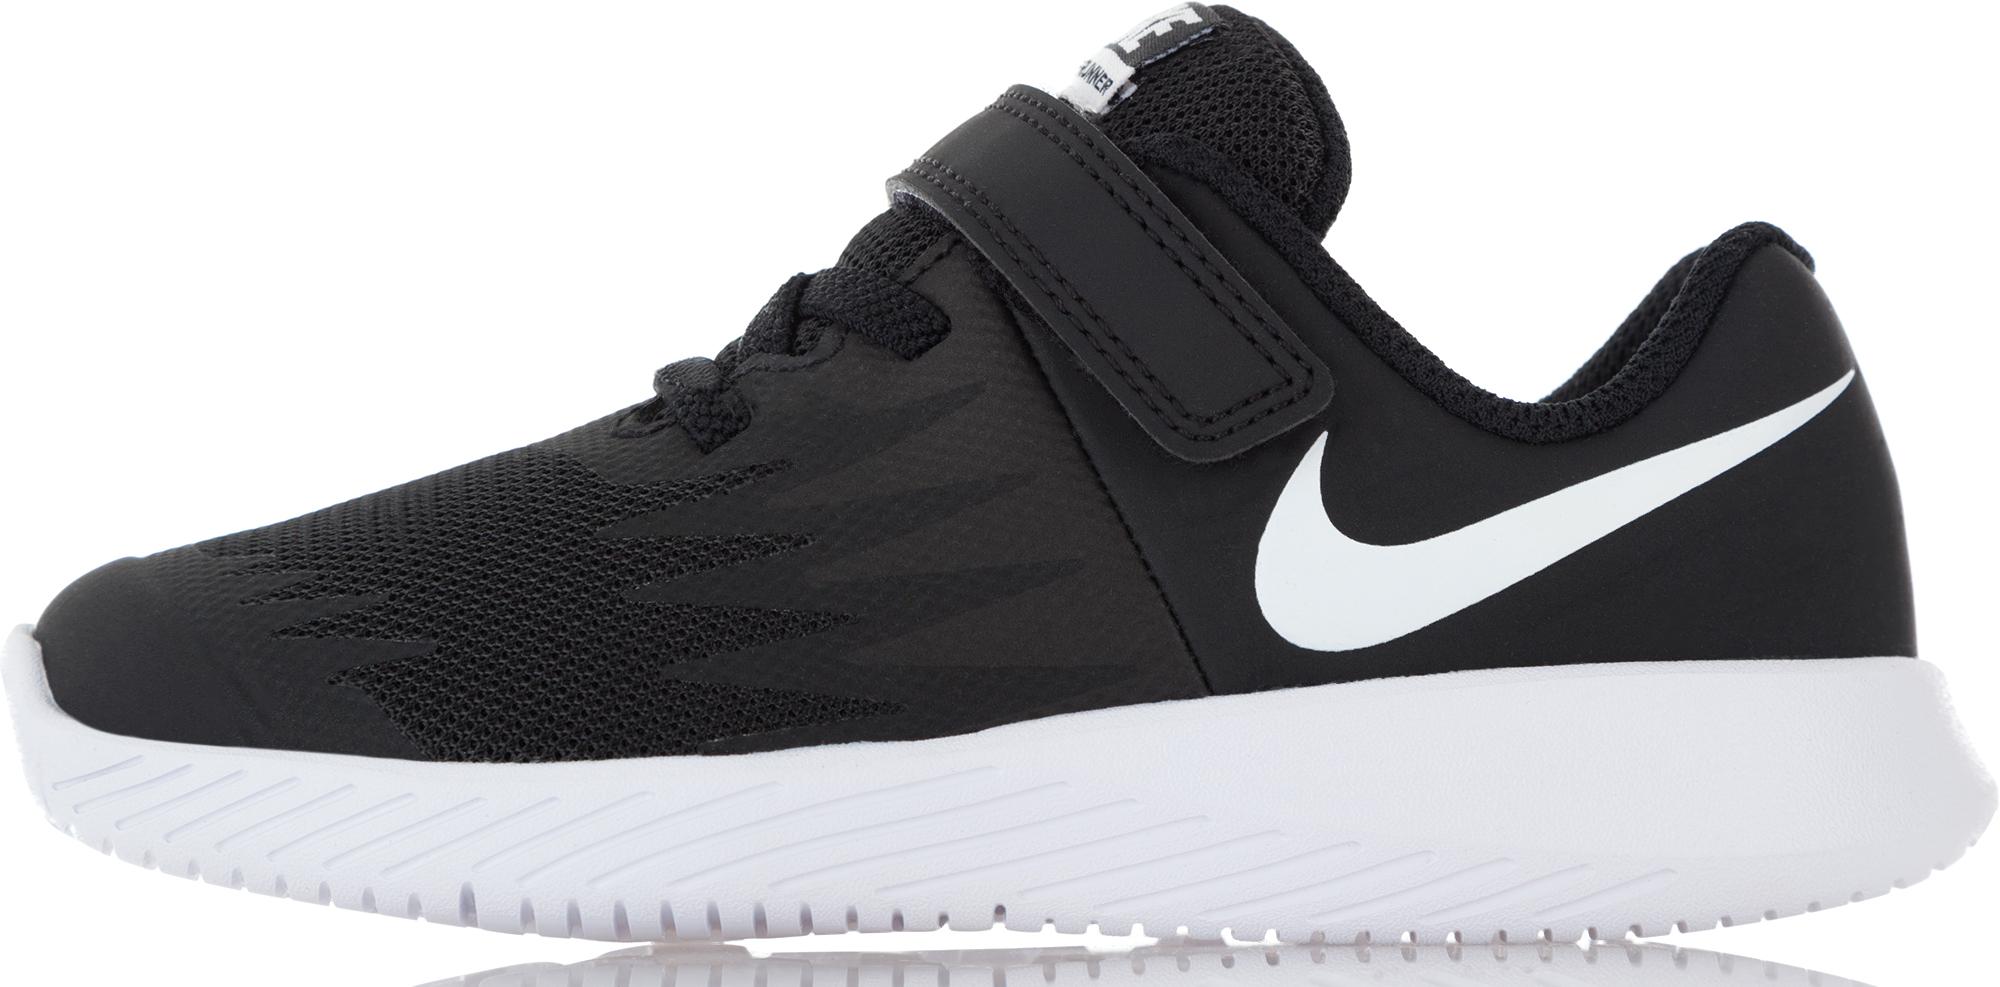 Nike Кроссовки для мальчиков Nike Star Runner кроссовки nike кроссовки md runner 2